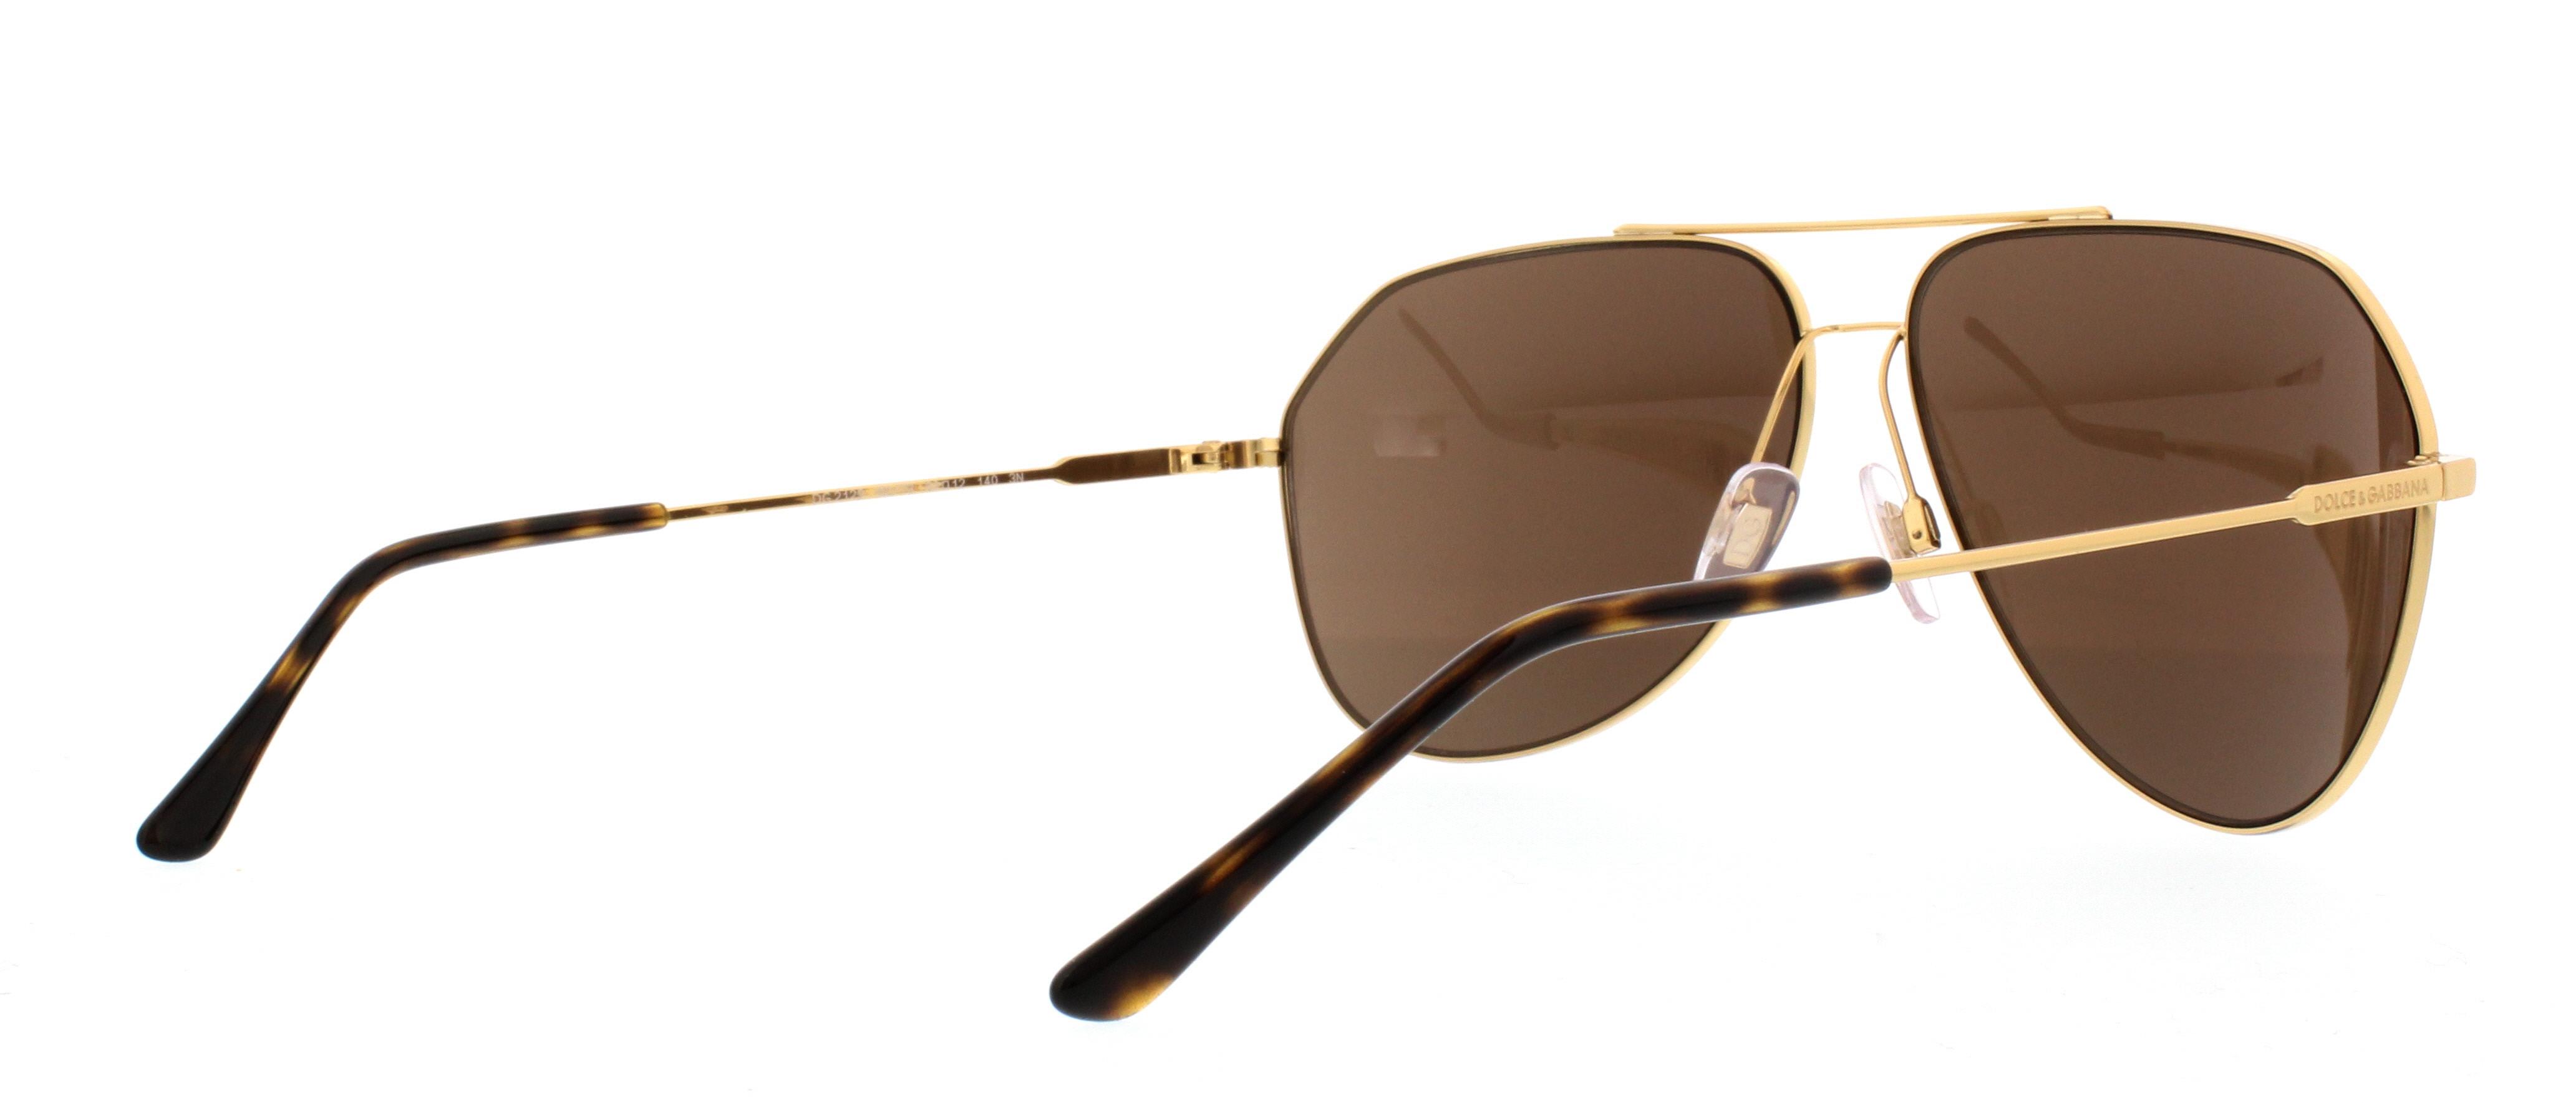 c7846e3bb77 Dolce And Gabbana Sunglasses Ebay Uk